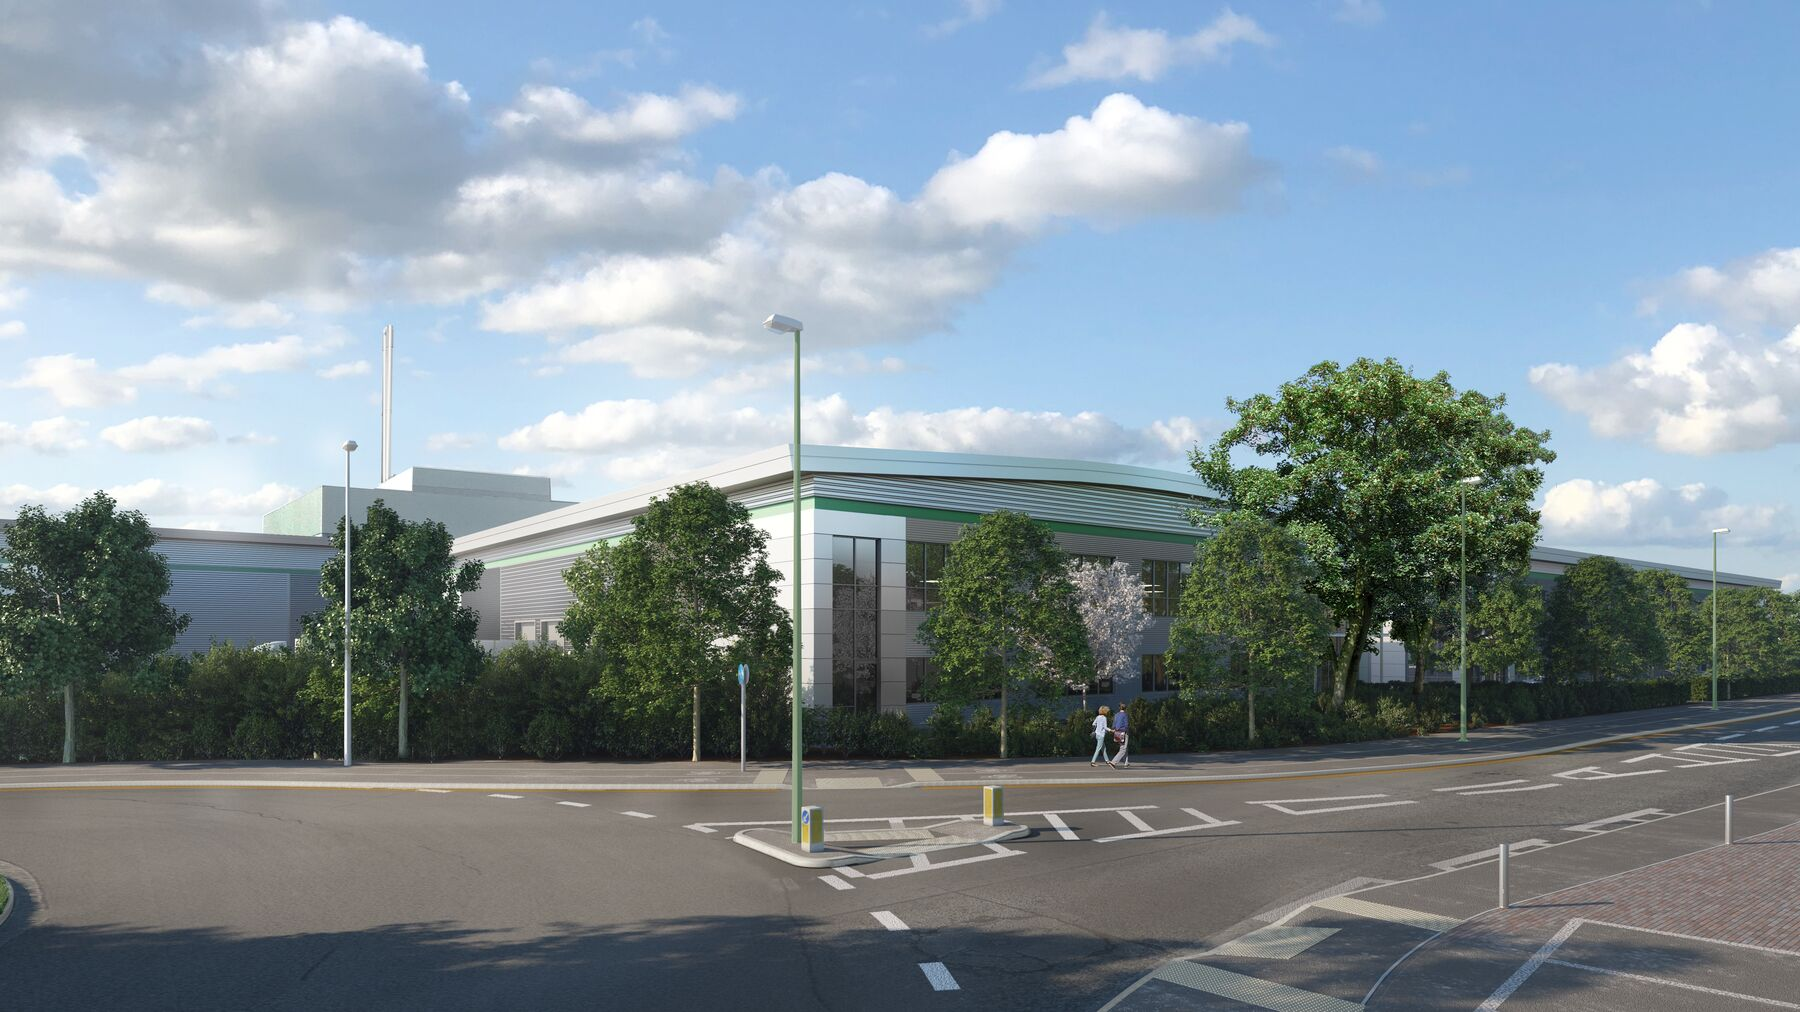 DPM-Beddington-Croydon_rendering_-3.jpg